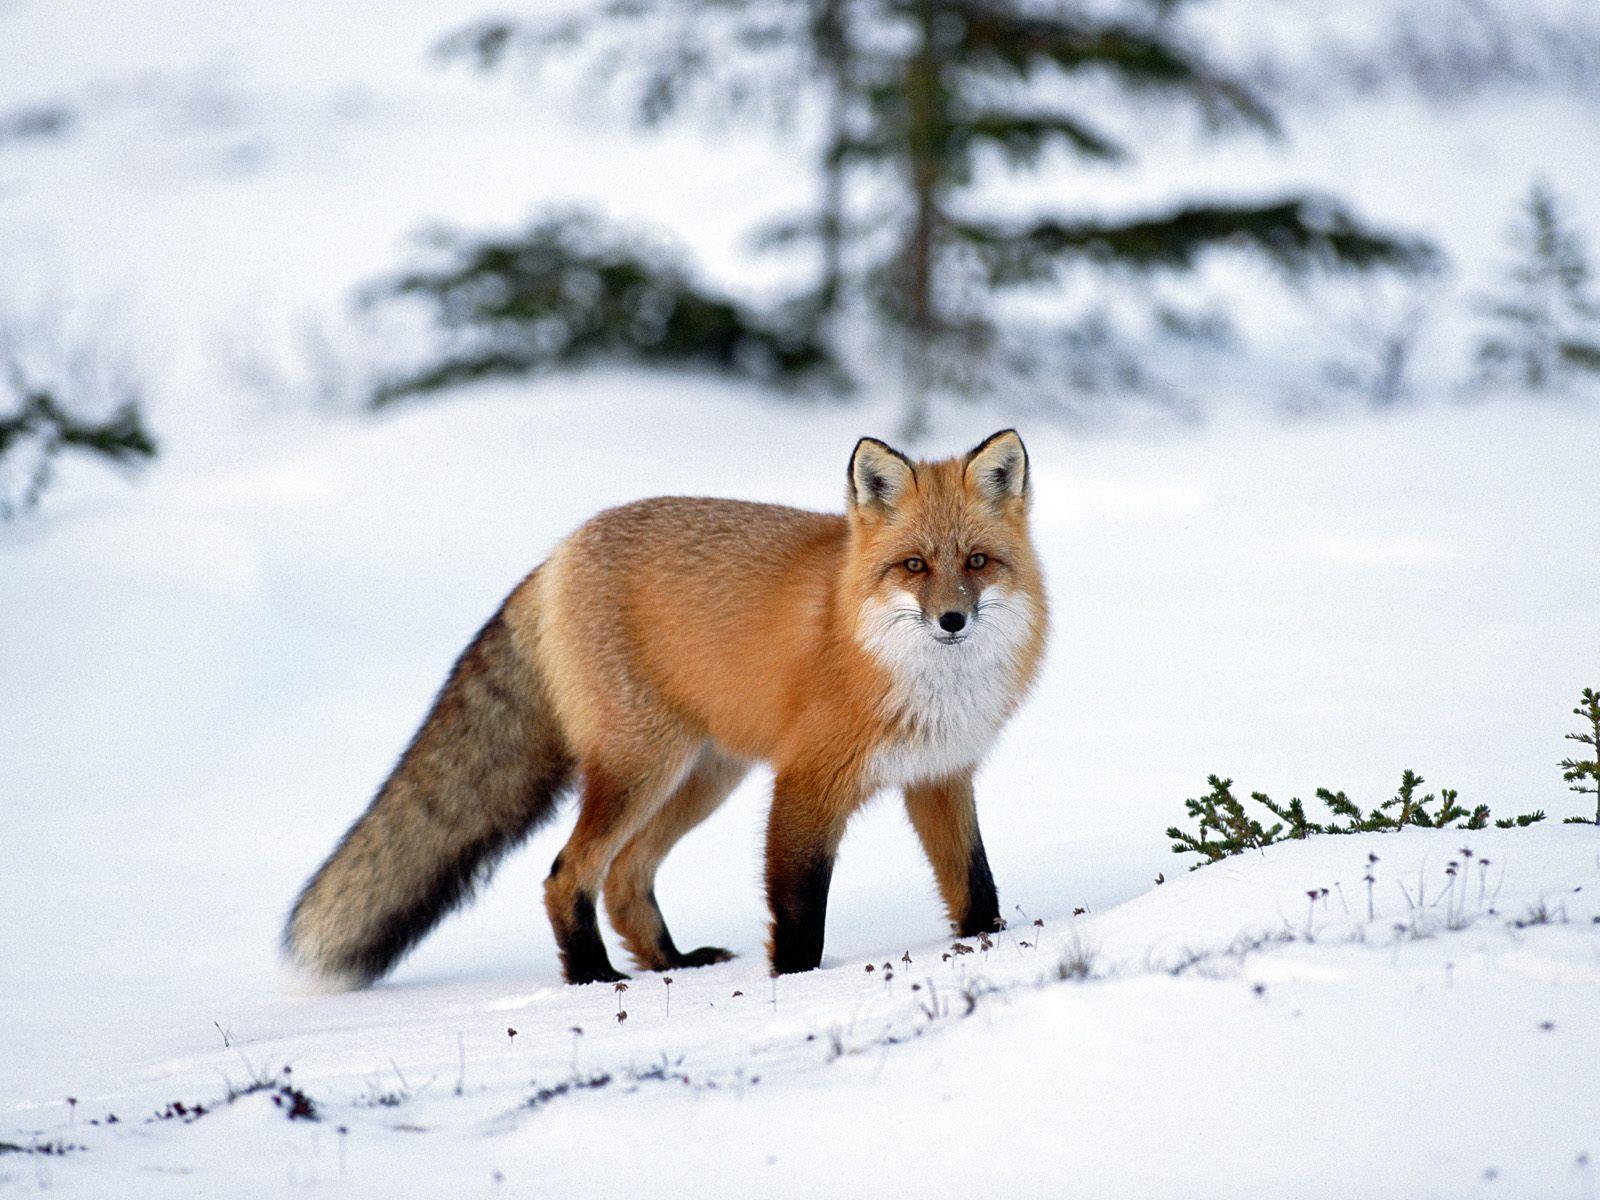 http://2.bp.blogspot.com/-DYsdiHHUwes/TxdqojJJdcI/AAAAAAAAGx4/d_ioesTC5lM/s1600/506-fox-snow-wallpaper-1600x1200-customity.jpg